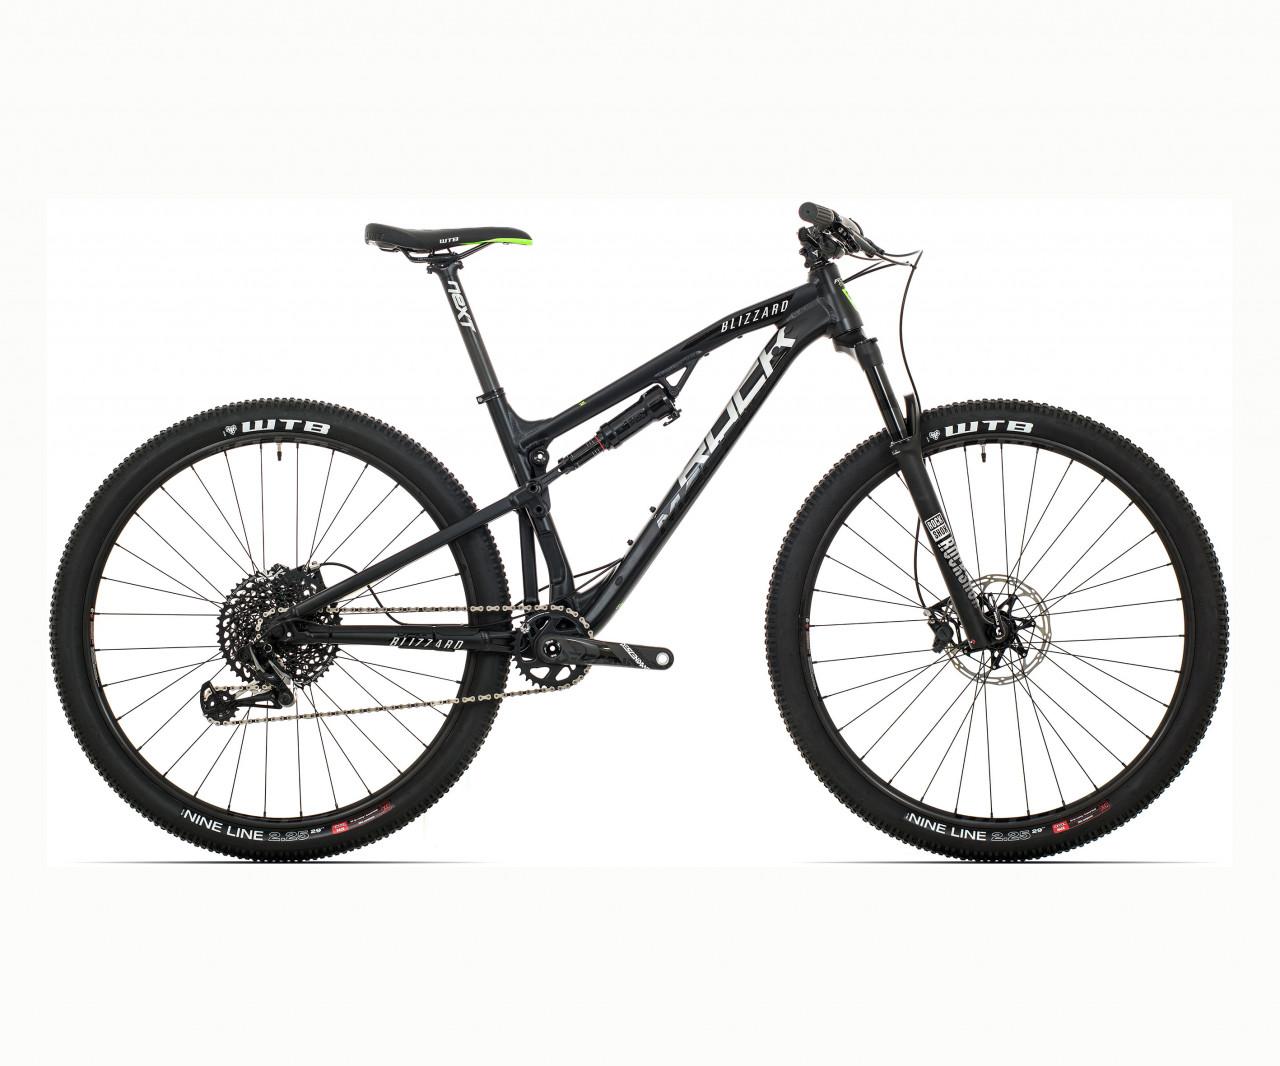 "Rock Machine Bicykel Blizzard XCM 90 - 29"" 25th Anniversary Veľkosť : 17,0"" (M)"